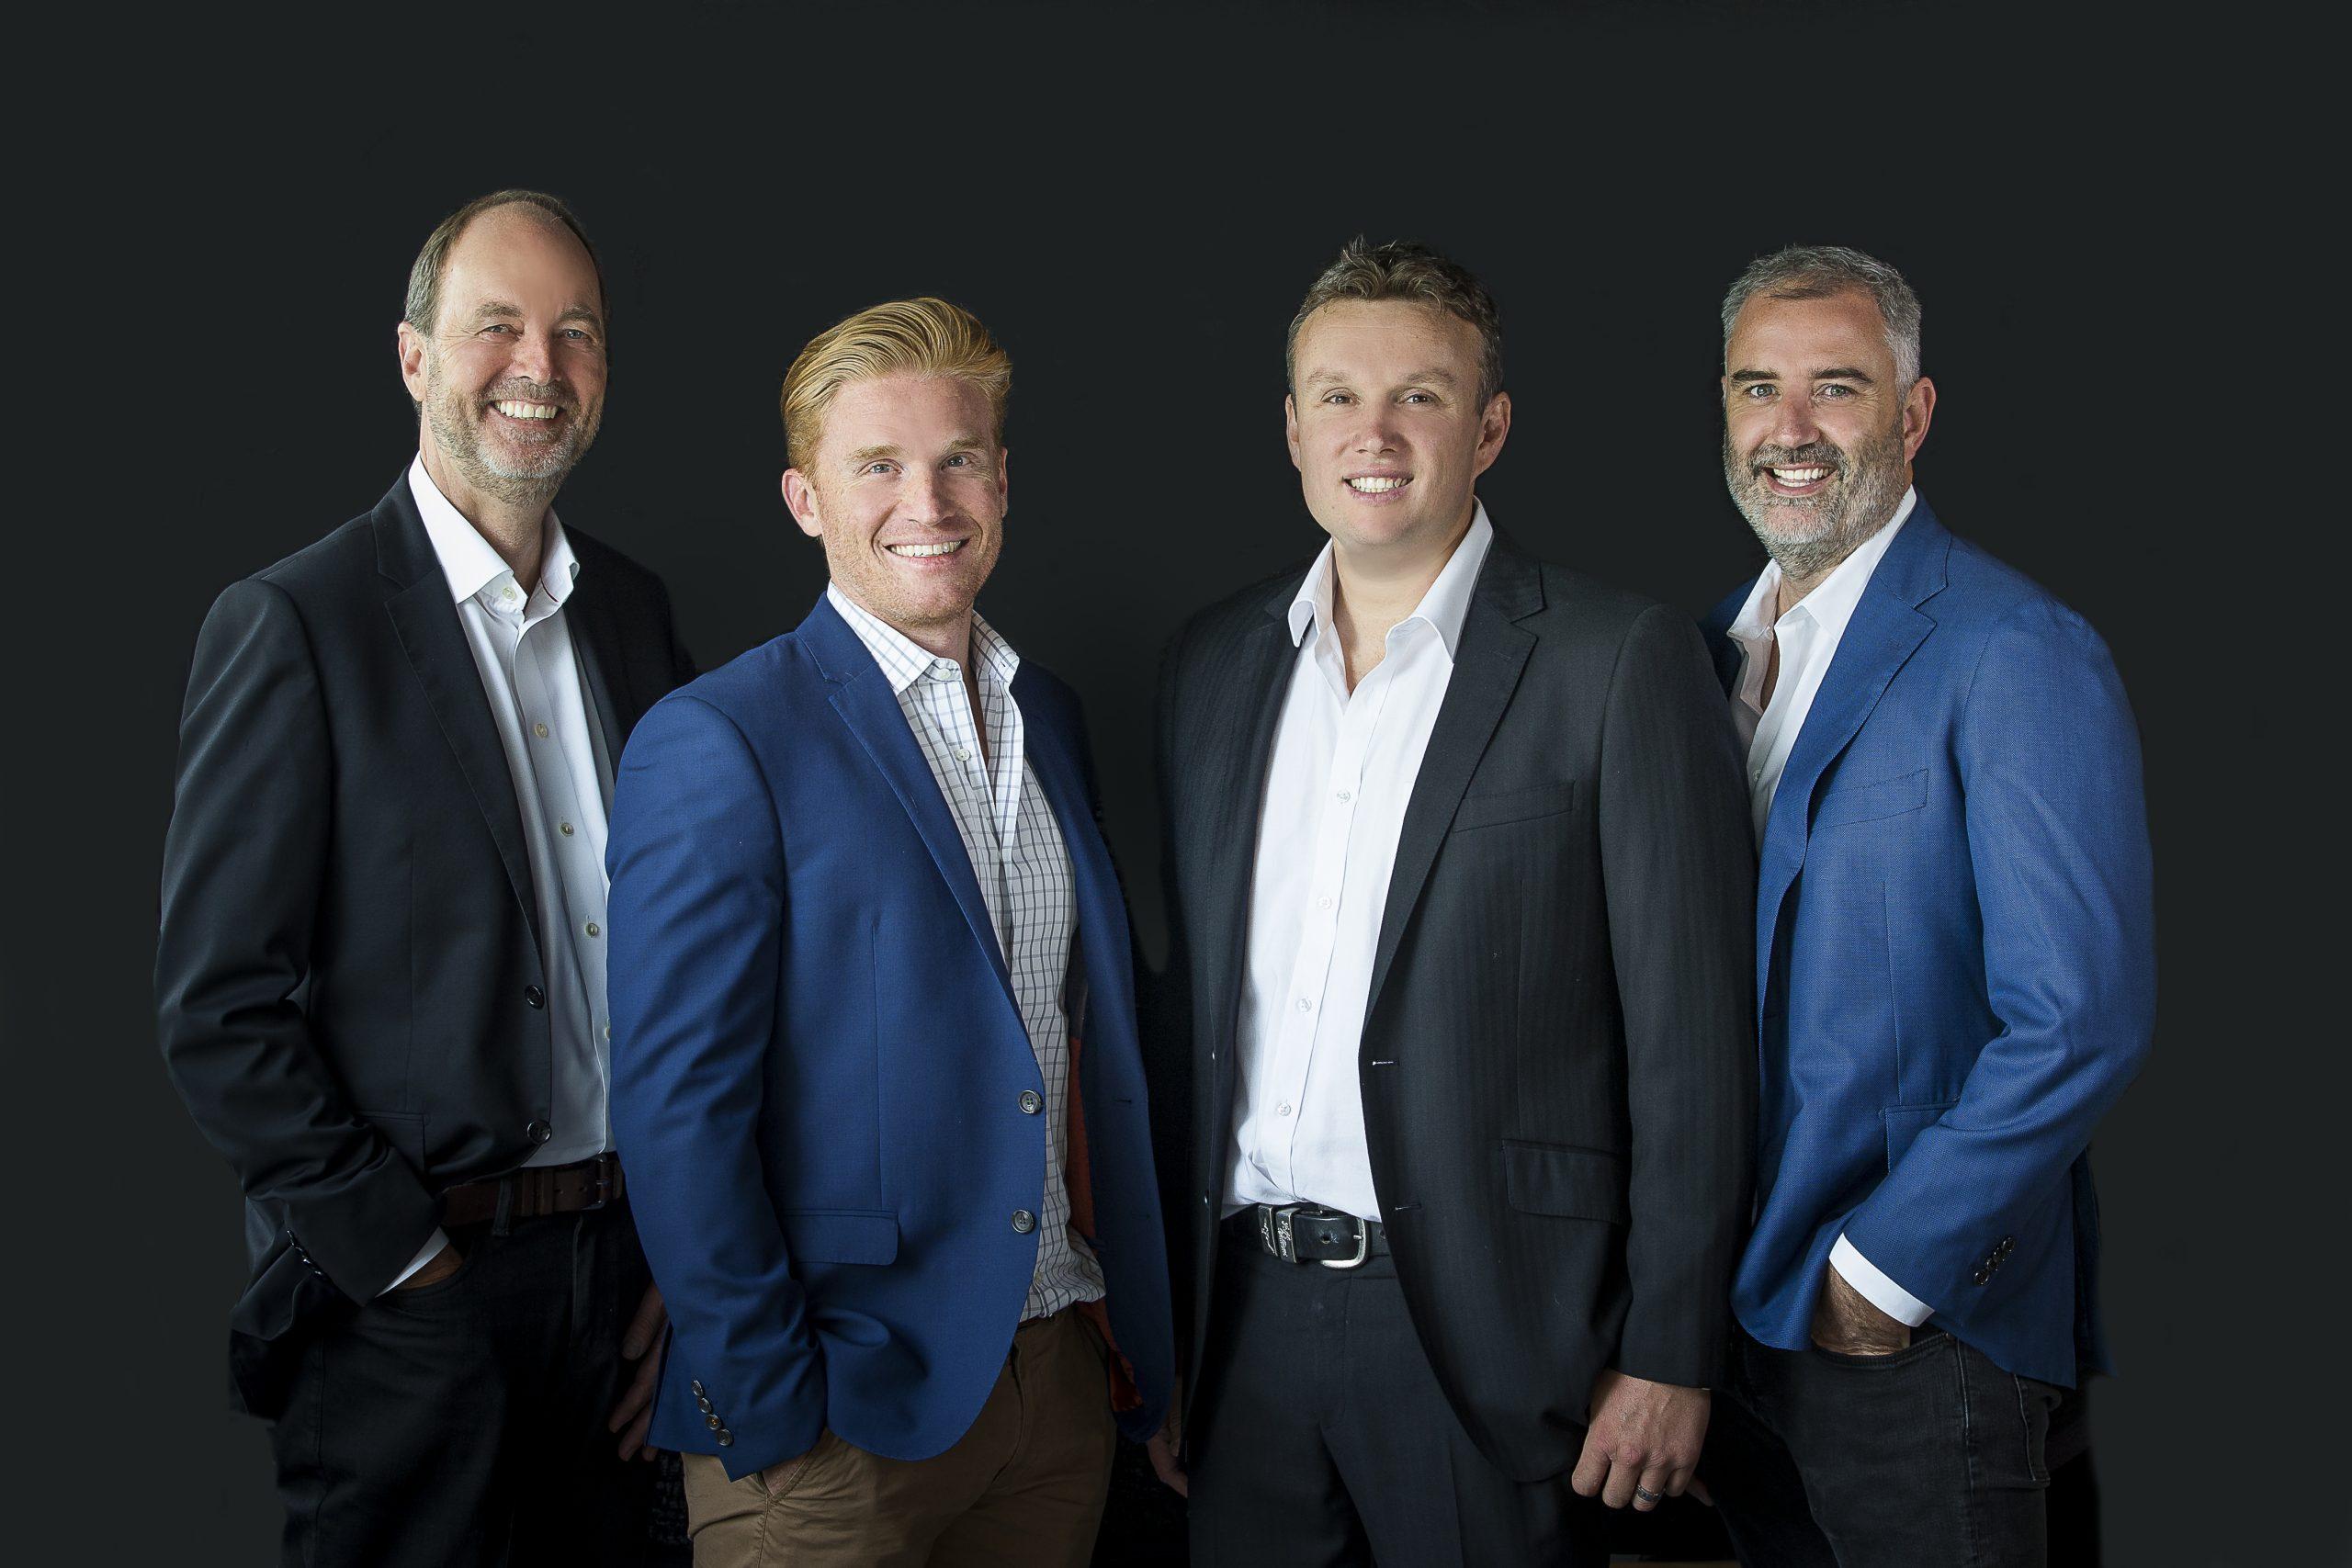 Former top Lendlease retirement executive Michael Eggington has joined boutique residential developer ThirdAge.